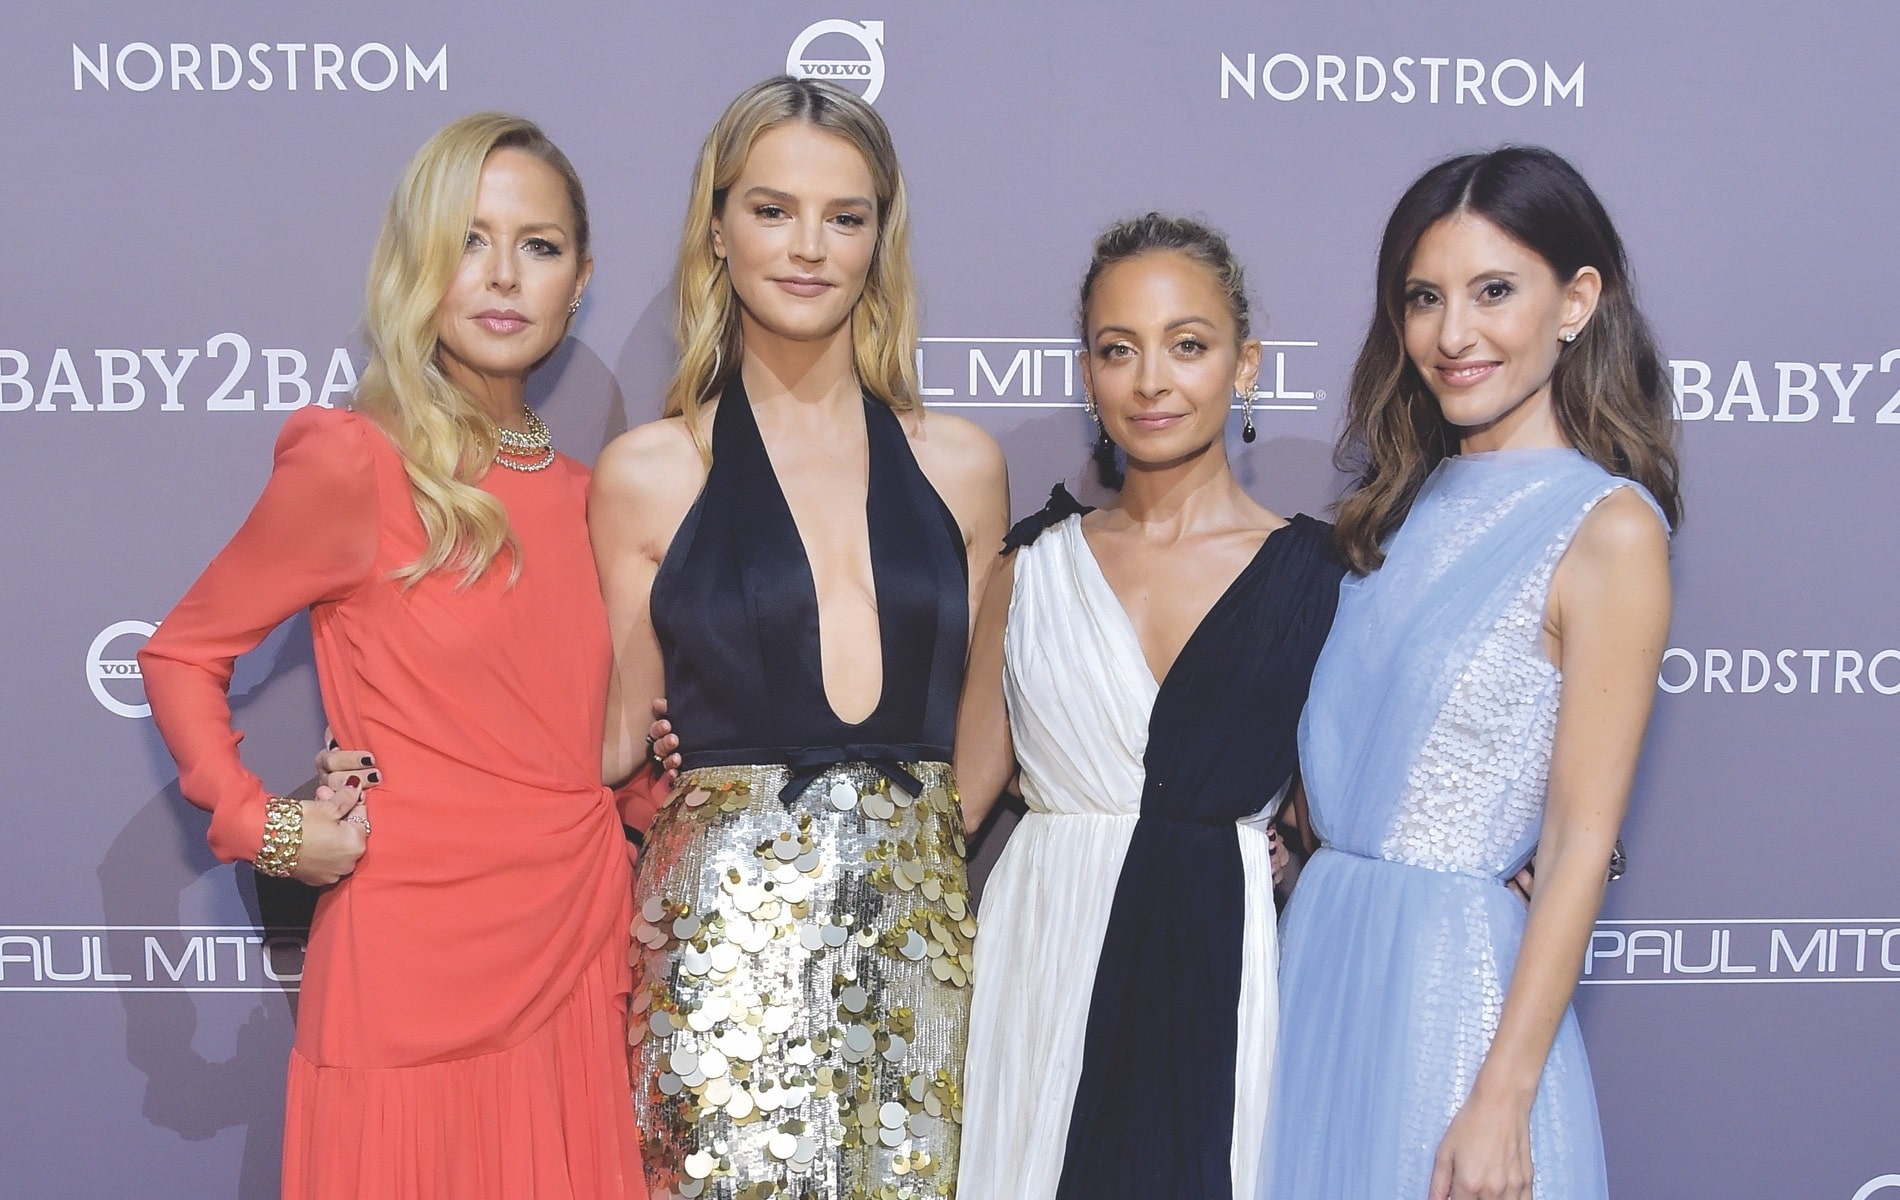 Rachel Zoe, Kelly Sawyer Patricof, Nicole Richie, Norah Weinstein, Baby2Baby Gala, Volvo, Paul Mitchell, Nordstrom